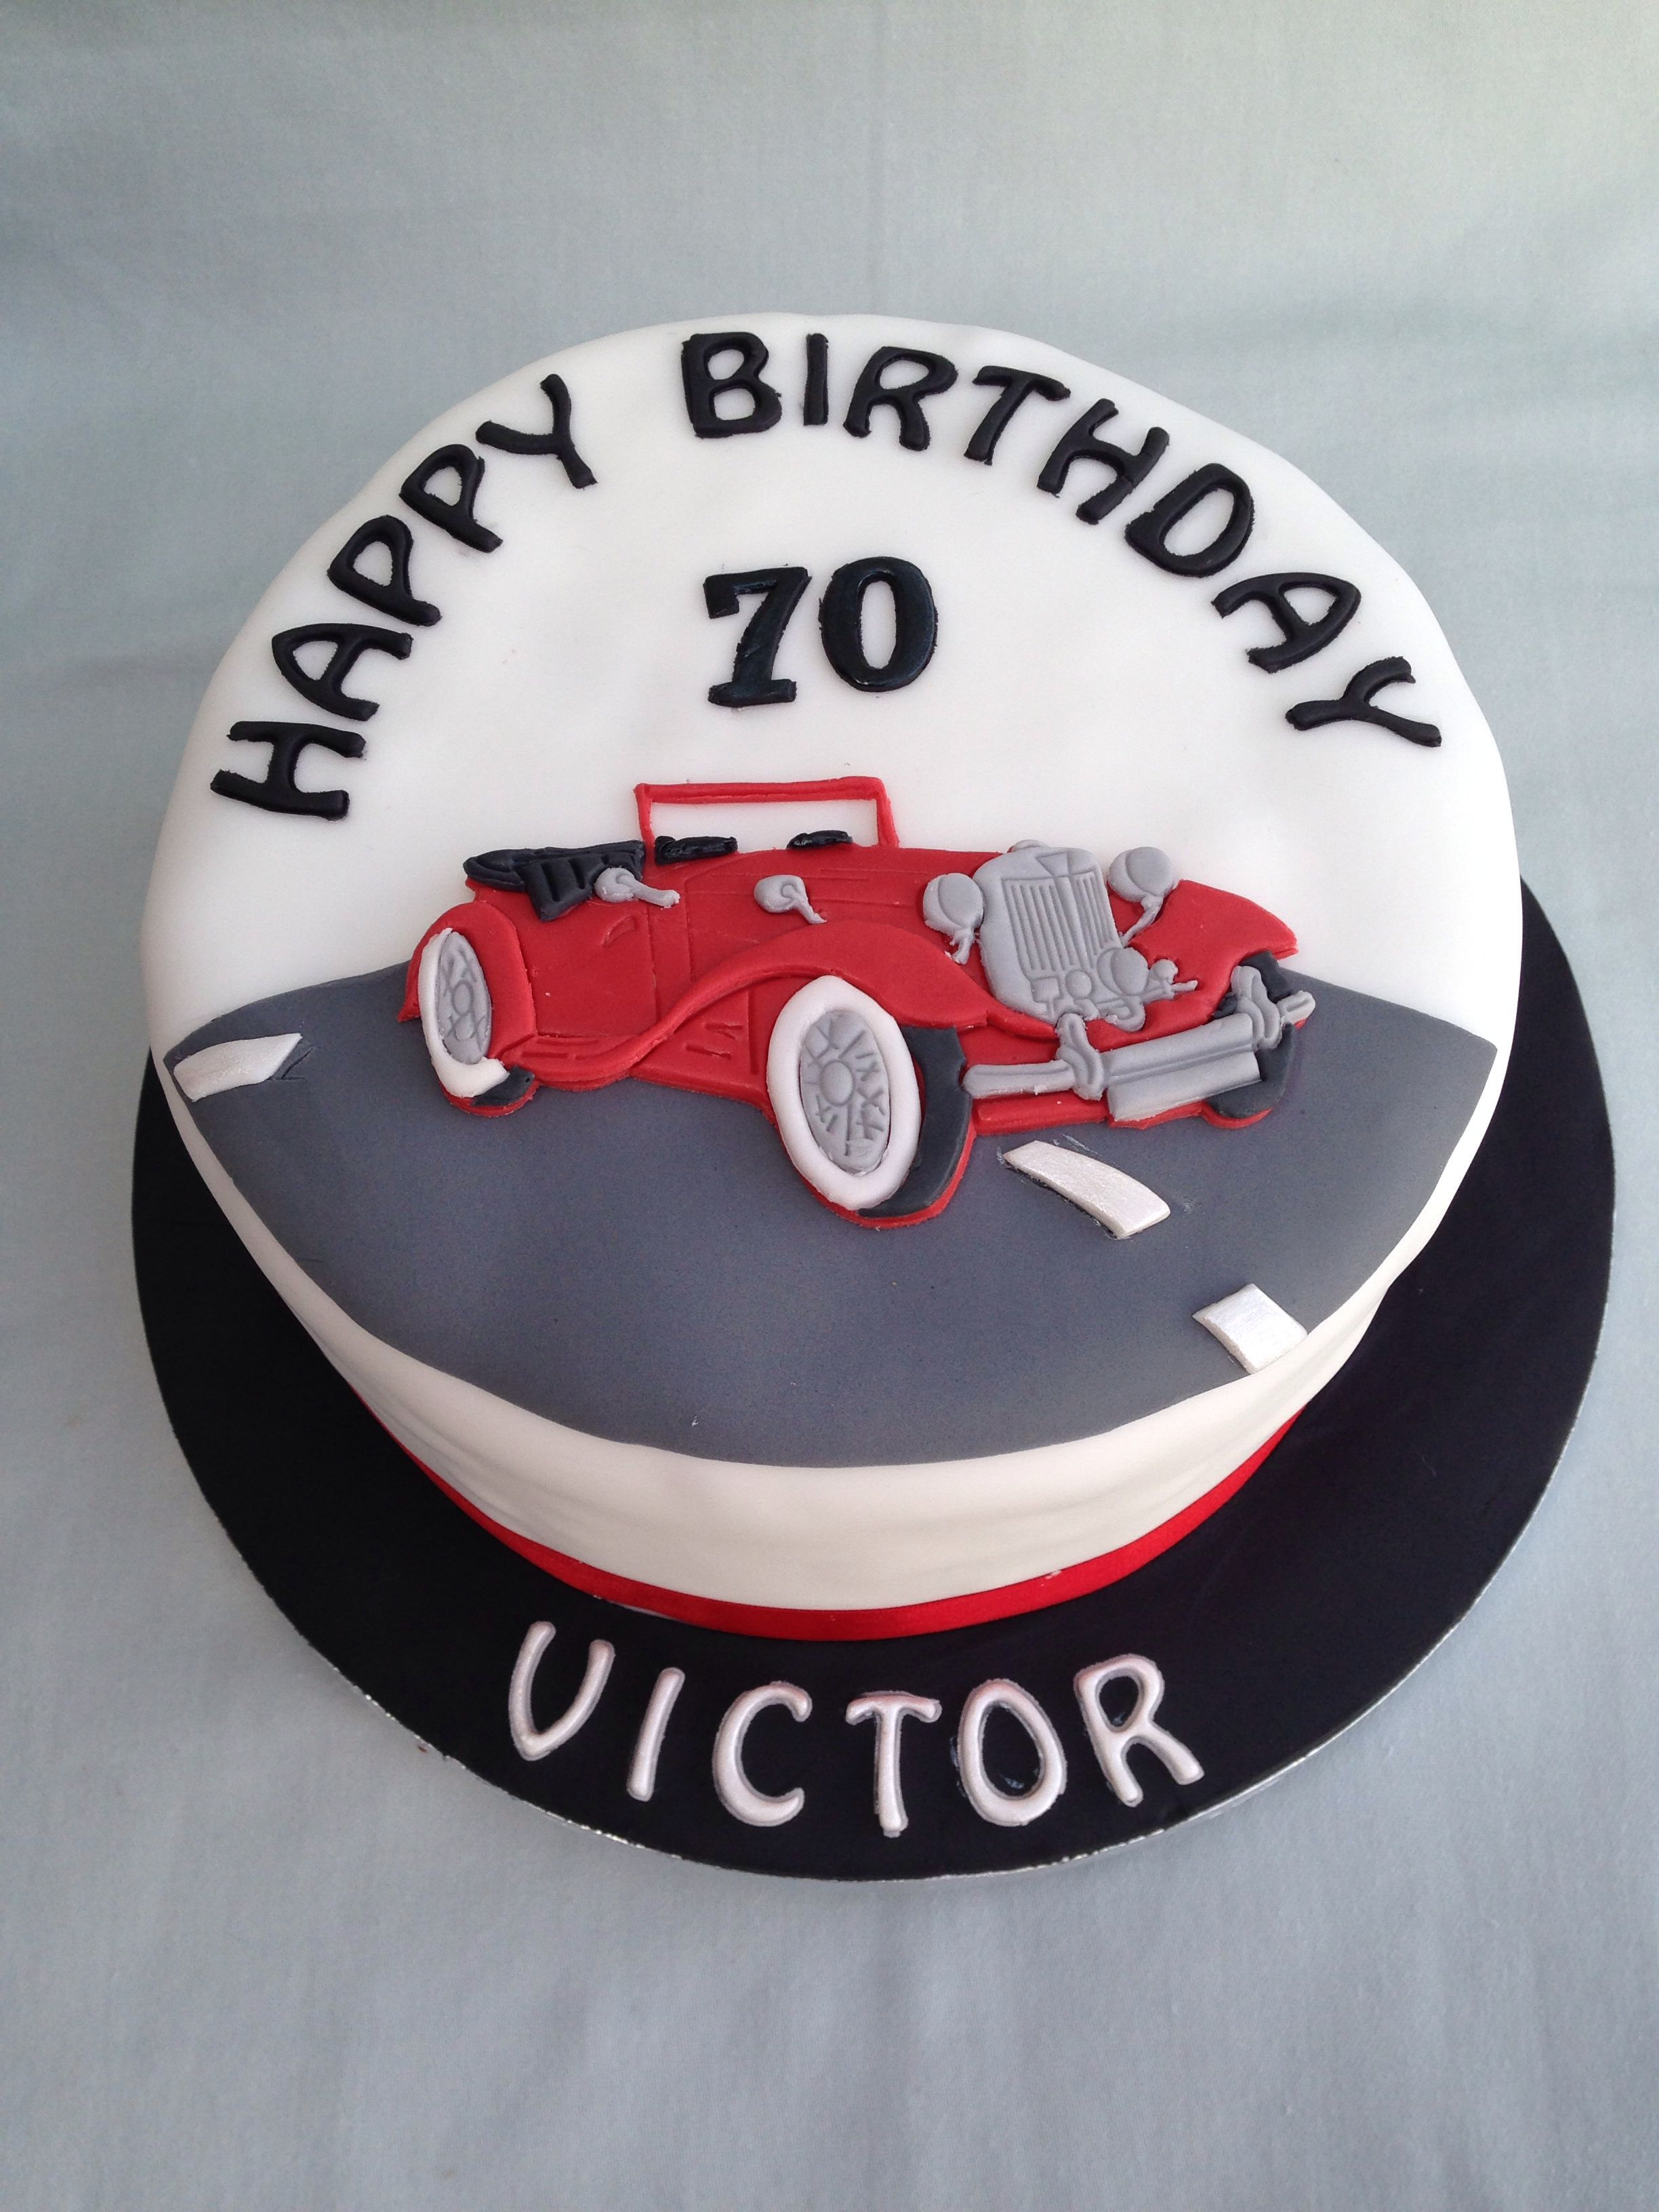 Vintage Car Theme Birthday Cake For A 70th Birthday